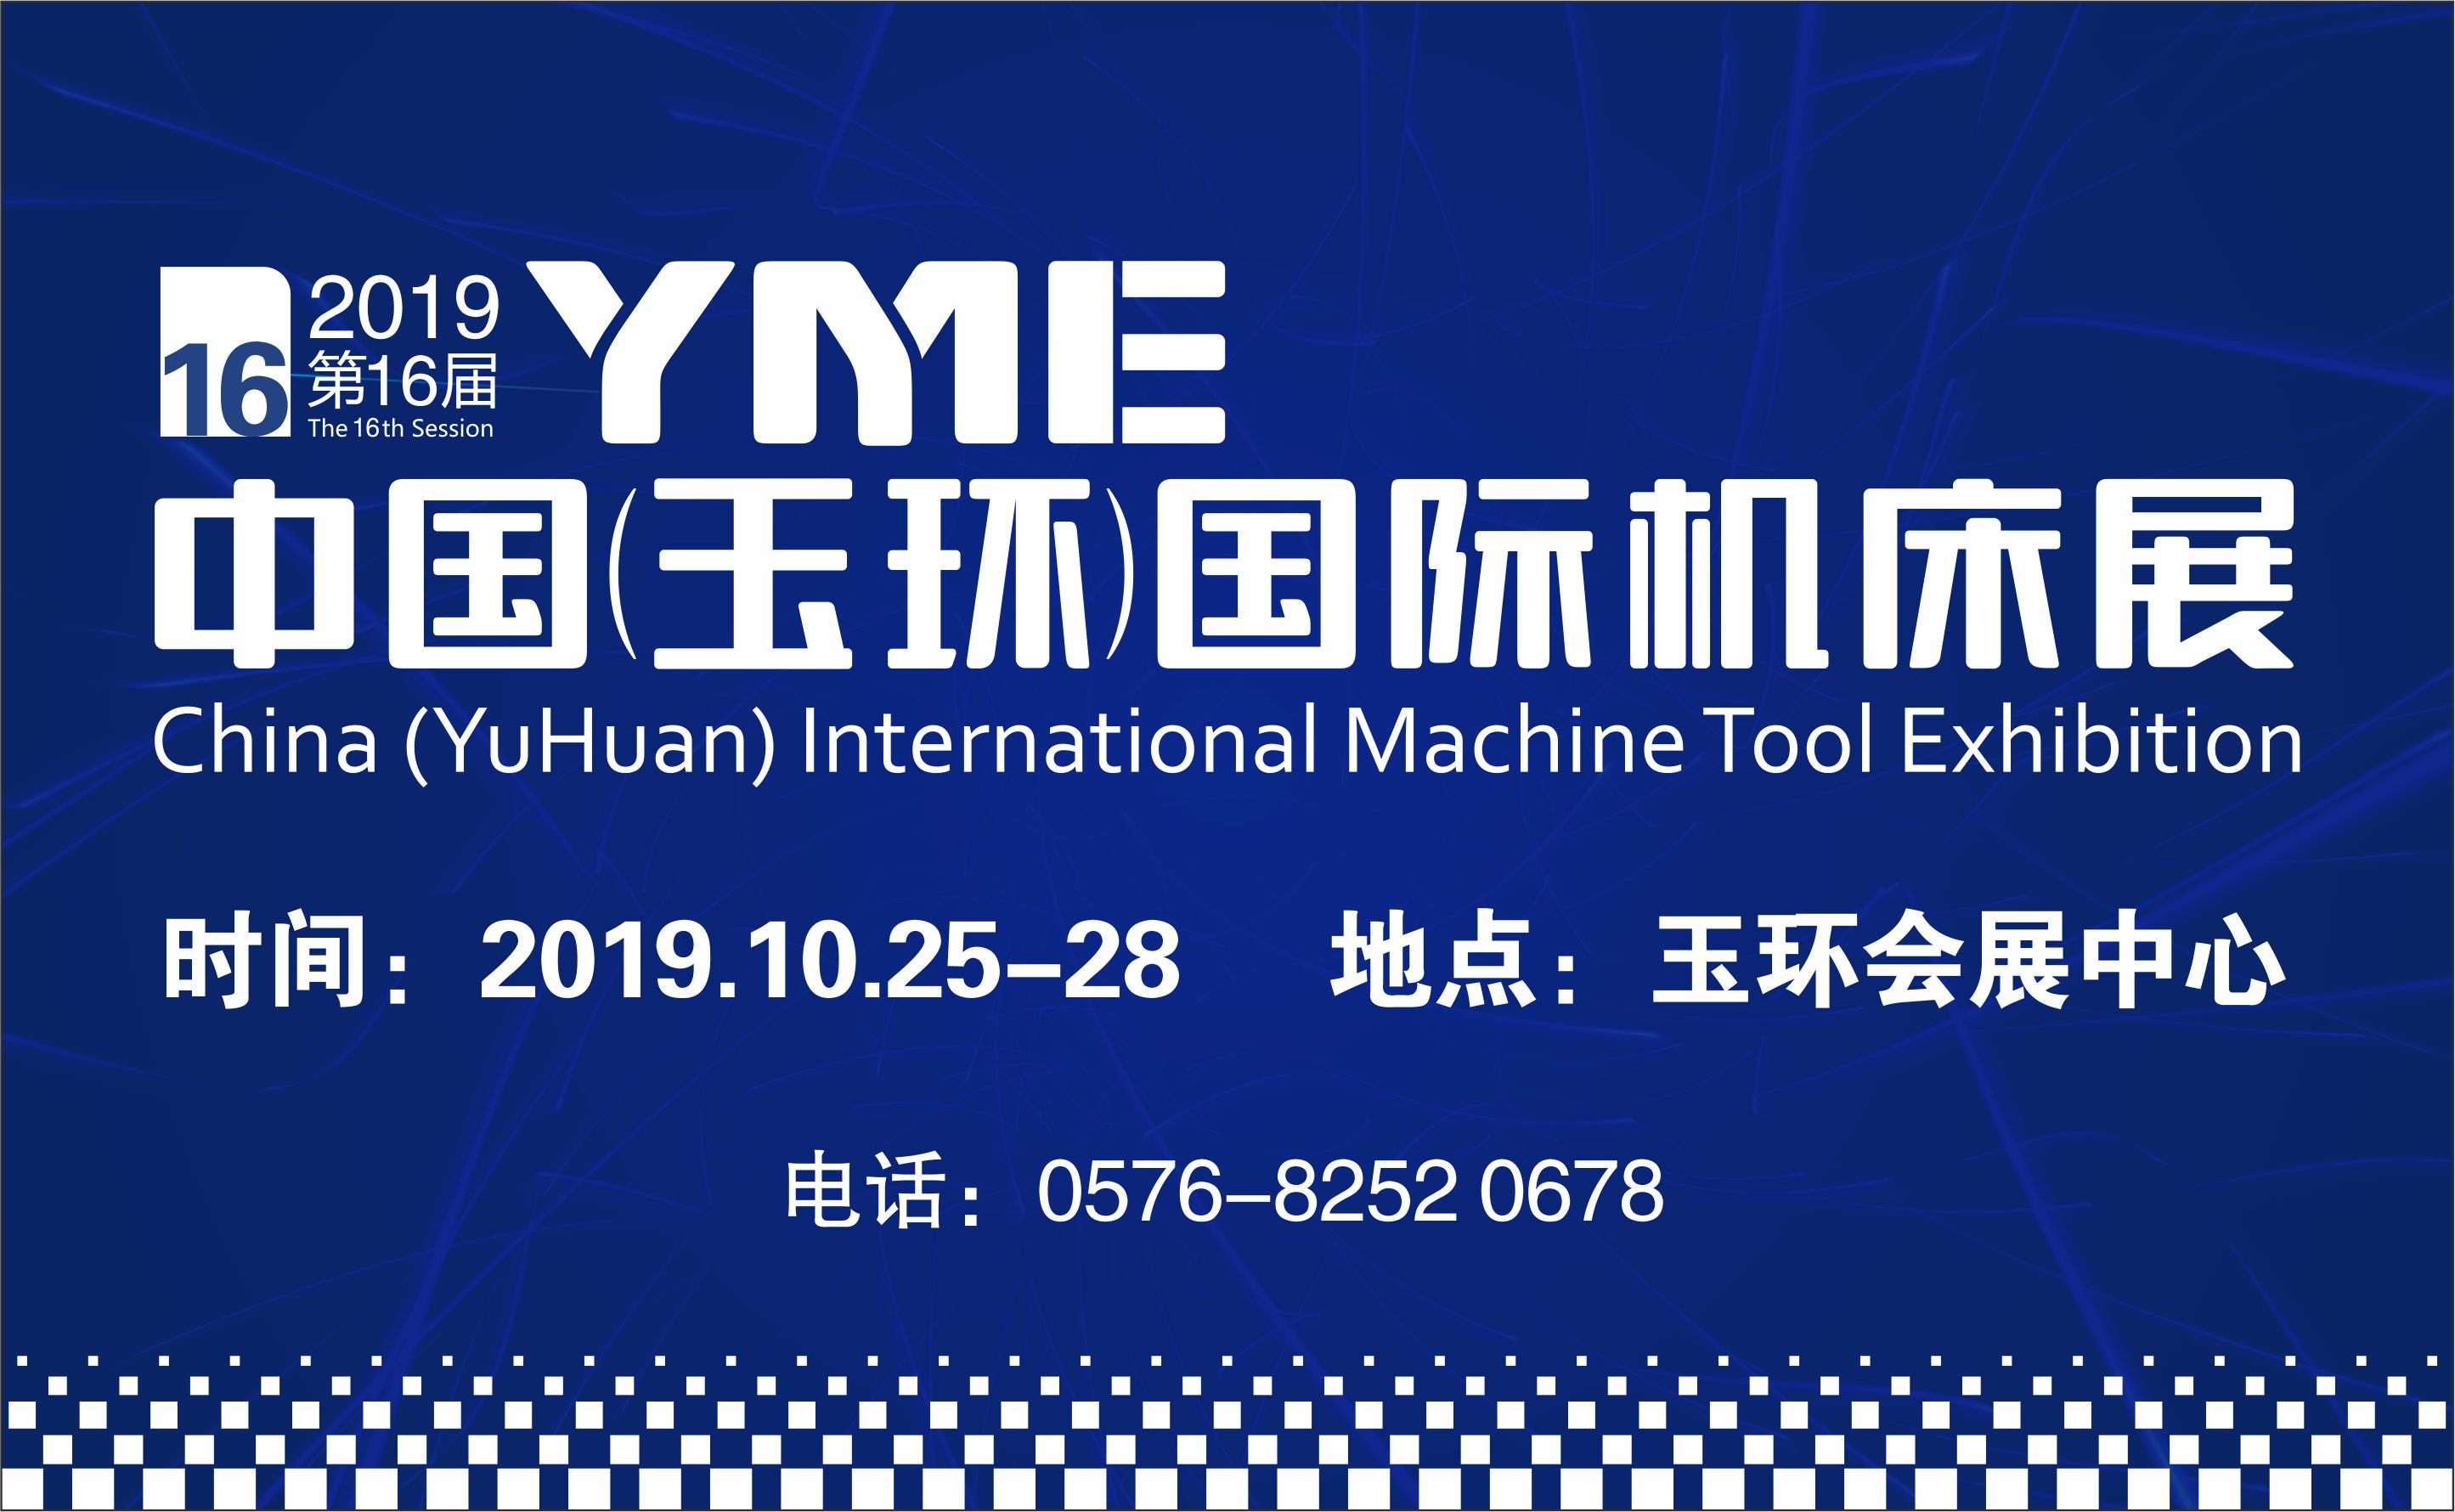 (YME2019)第16届中国(玉环)国际机床展